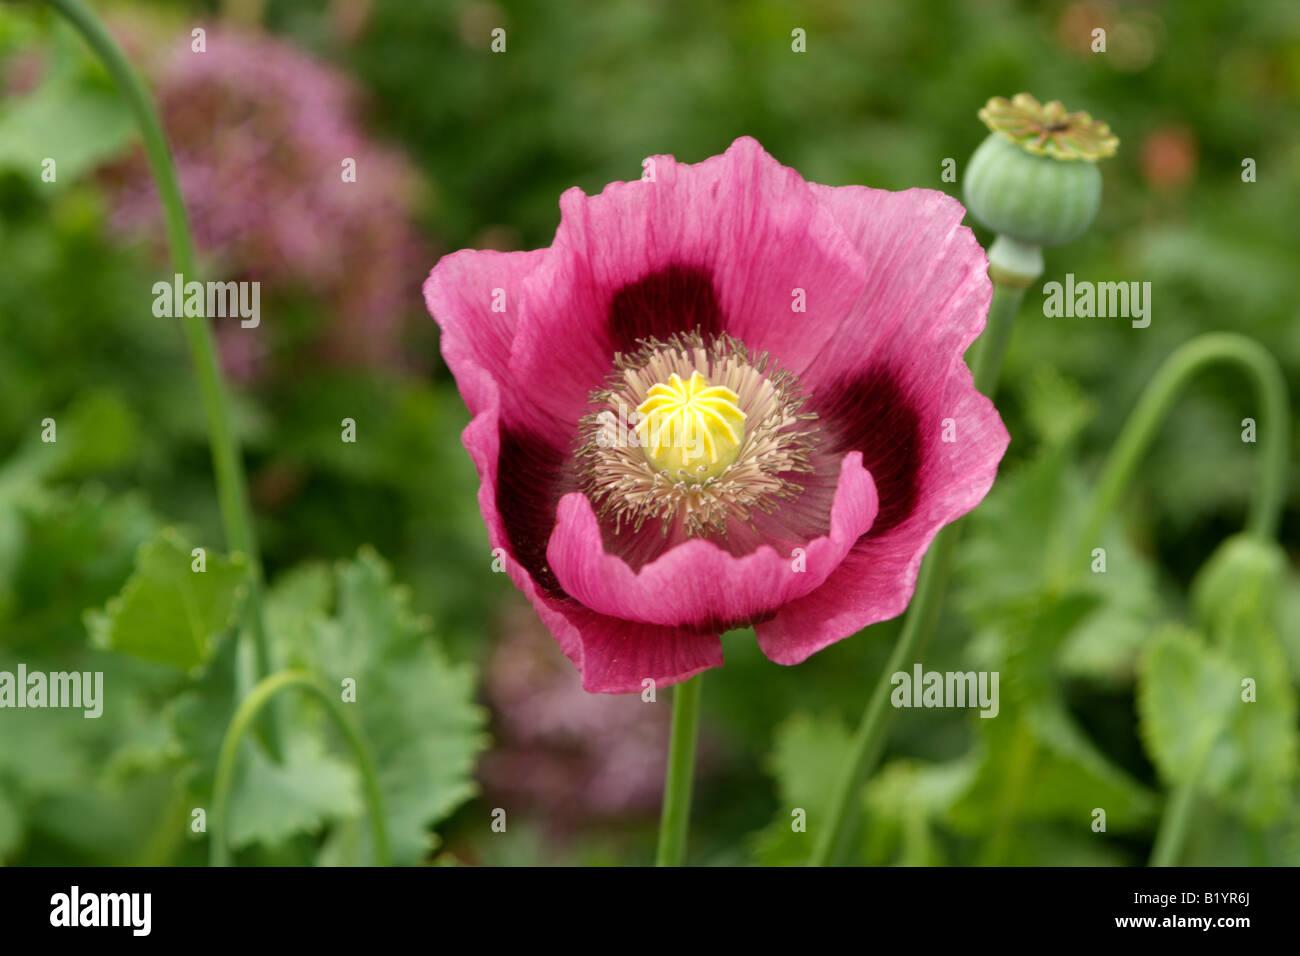 Opium Poppy In Flower With Seed Pod Stock Photos Opium Poppy In